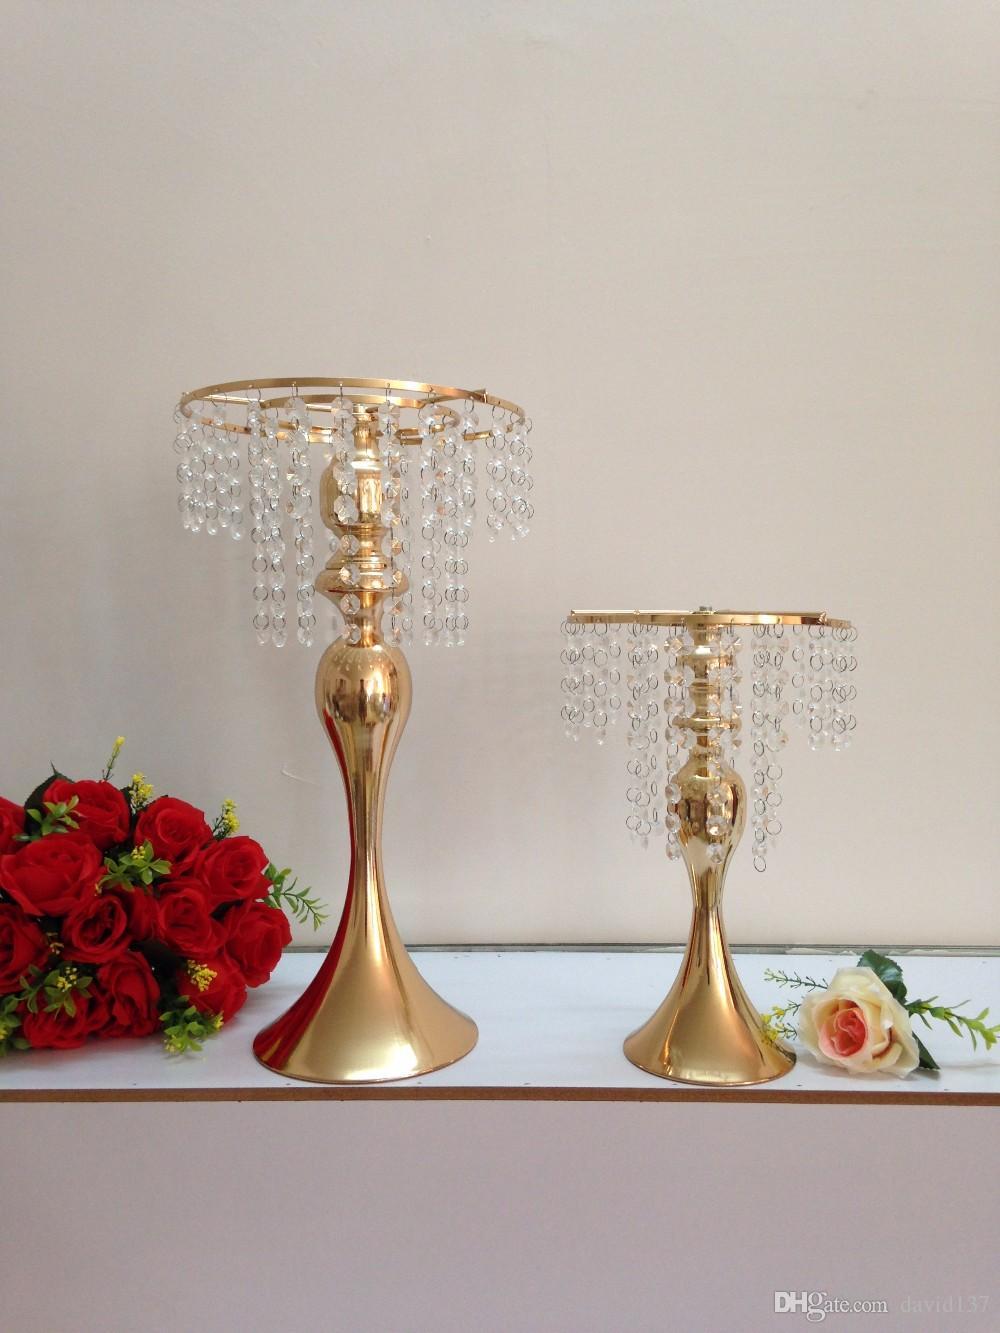 "33cm 13"" Gold Wedding Table Chandelier Wedding flower vase flower rack Wedding centerpiece small style"